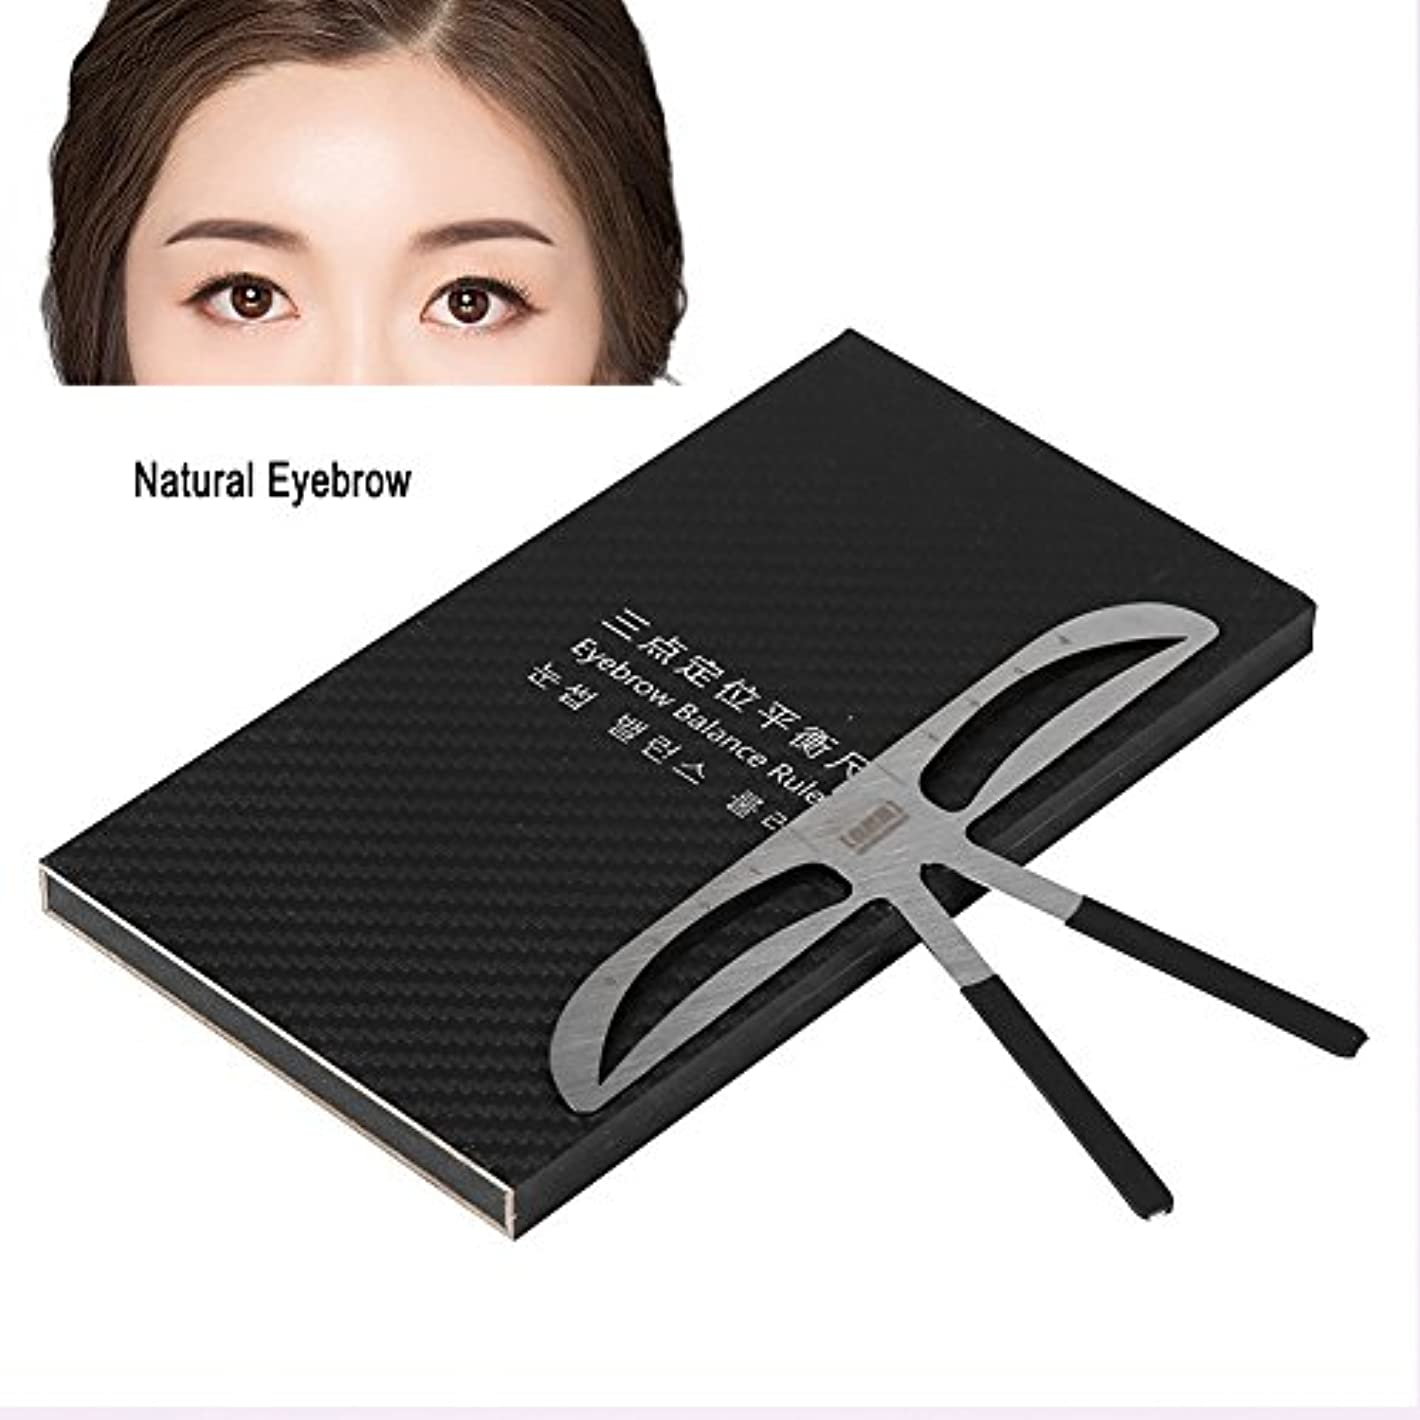 Ochun 眉毛テンプレート 眉毛メイクツール 眉毛を描く 位置測定 3点測定メイク 左右対称 眉毛用ルーラー(#1)